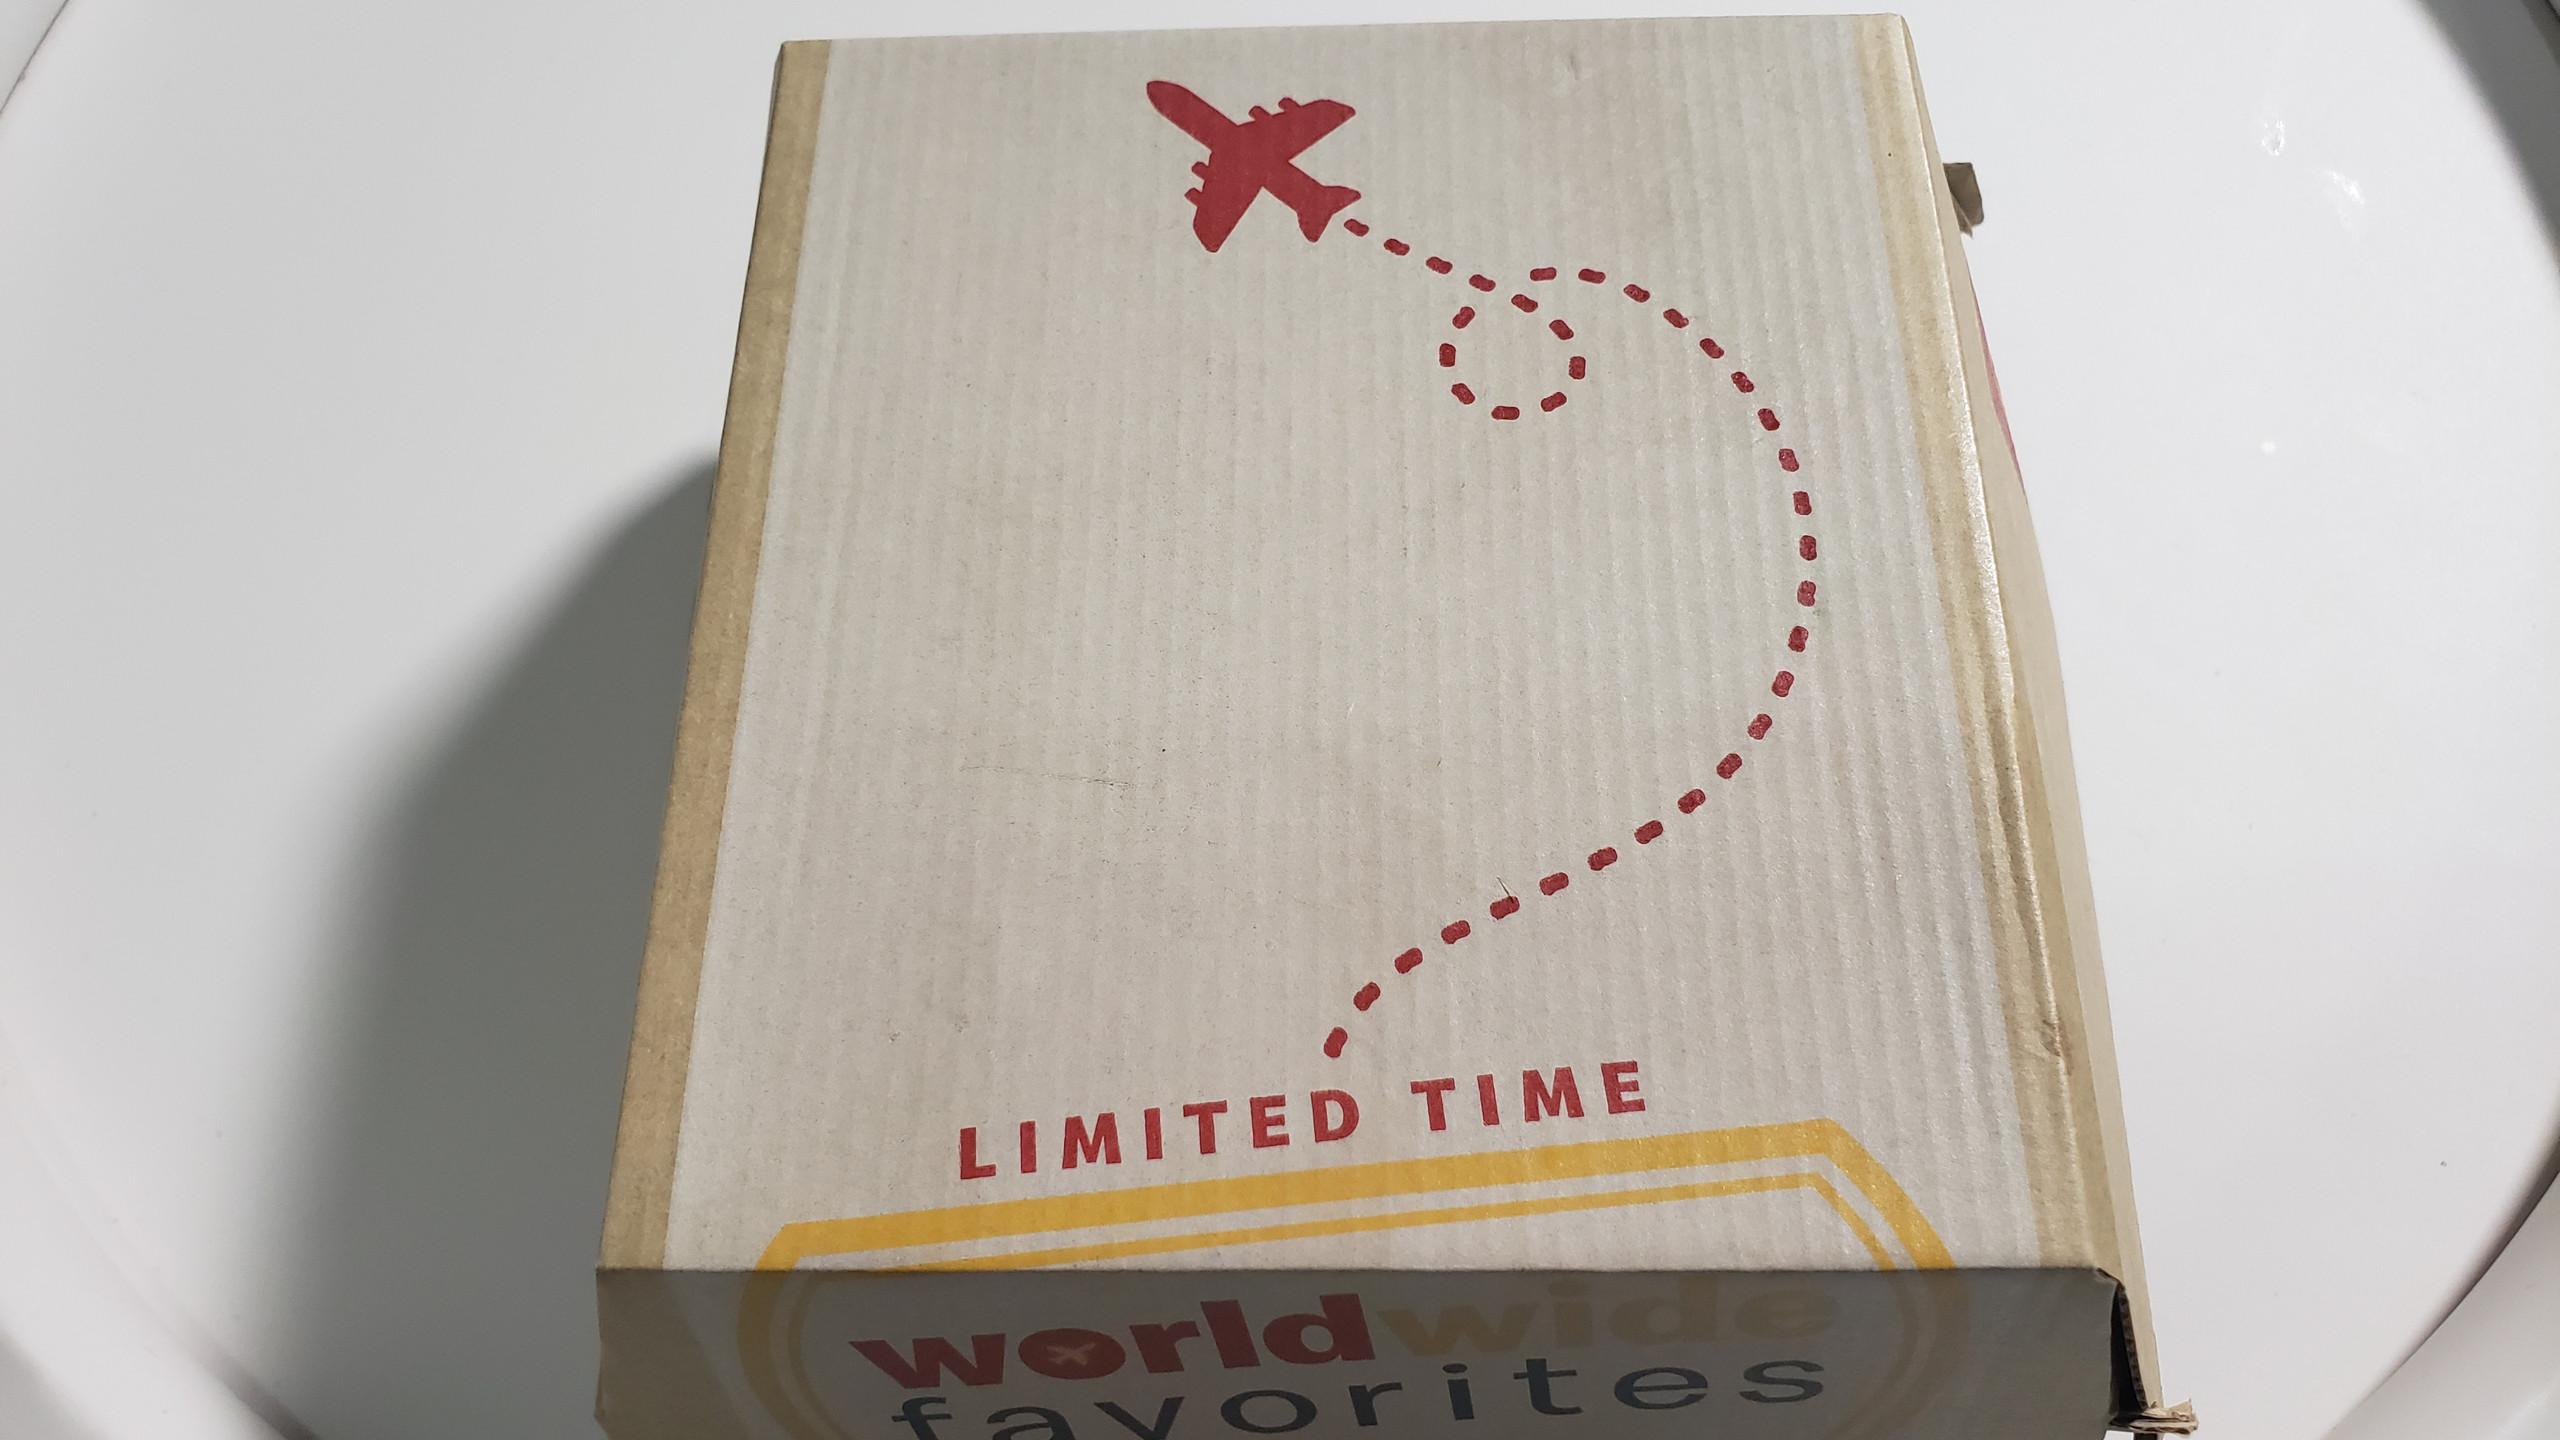 McDonald's Worldwide Favorites Box